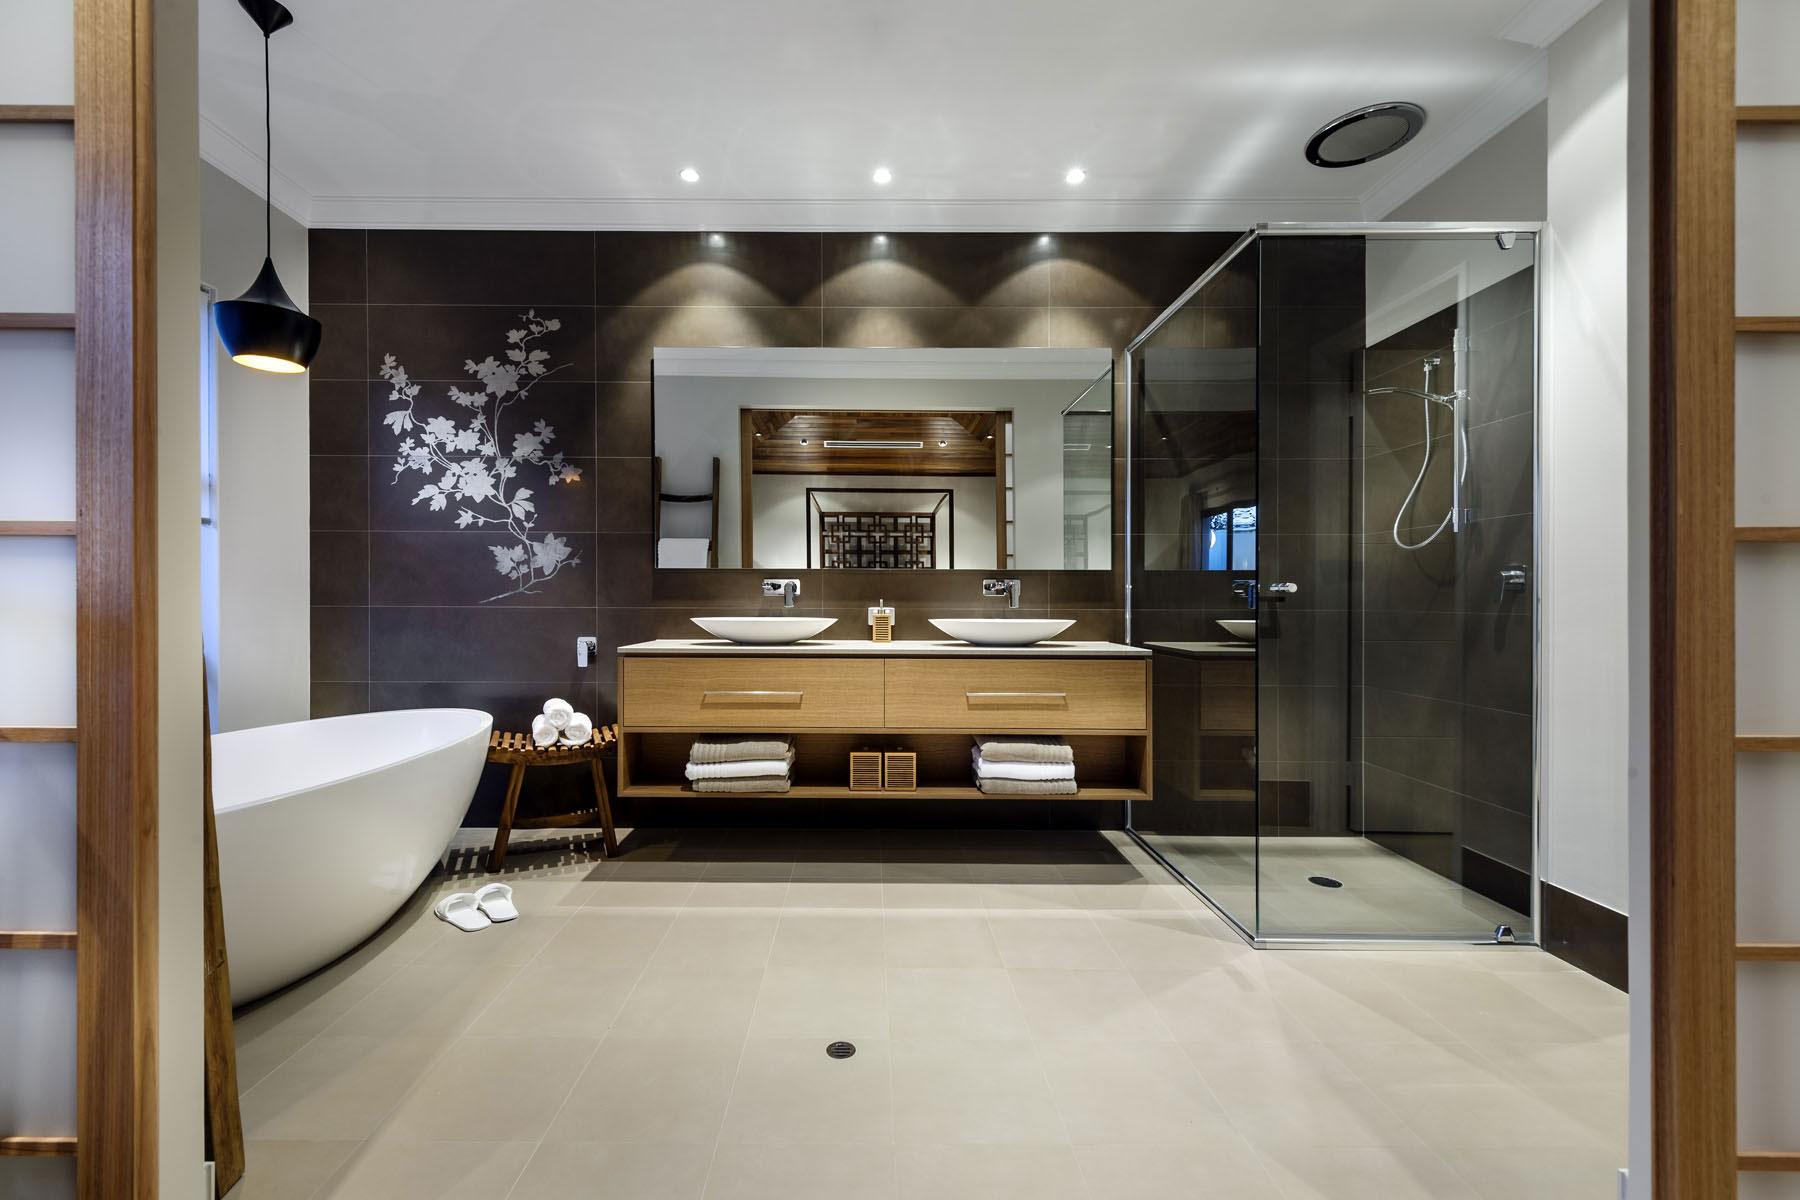 Glass Shower, Bath, Dark Tiles, Mirror, Double Sinks, House in Burns Beach, Perth